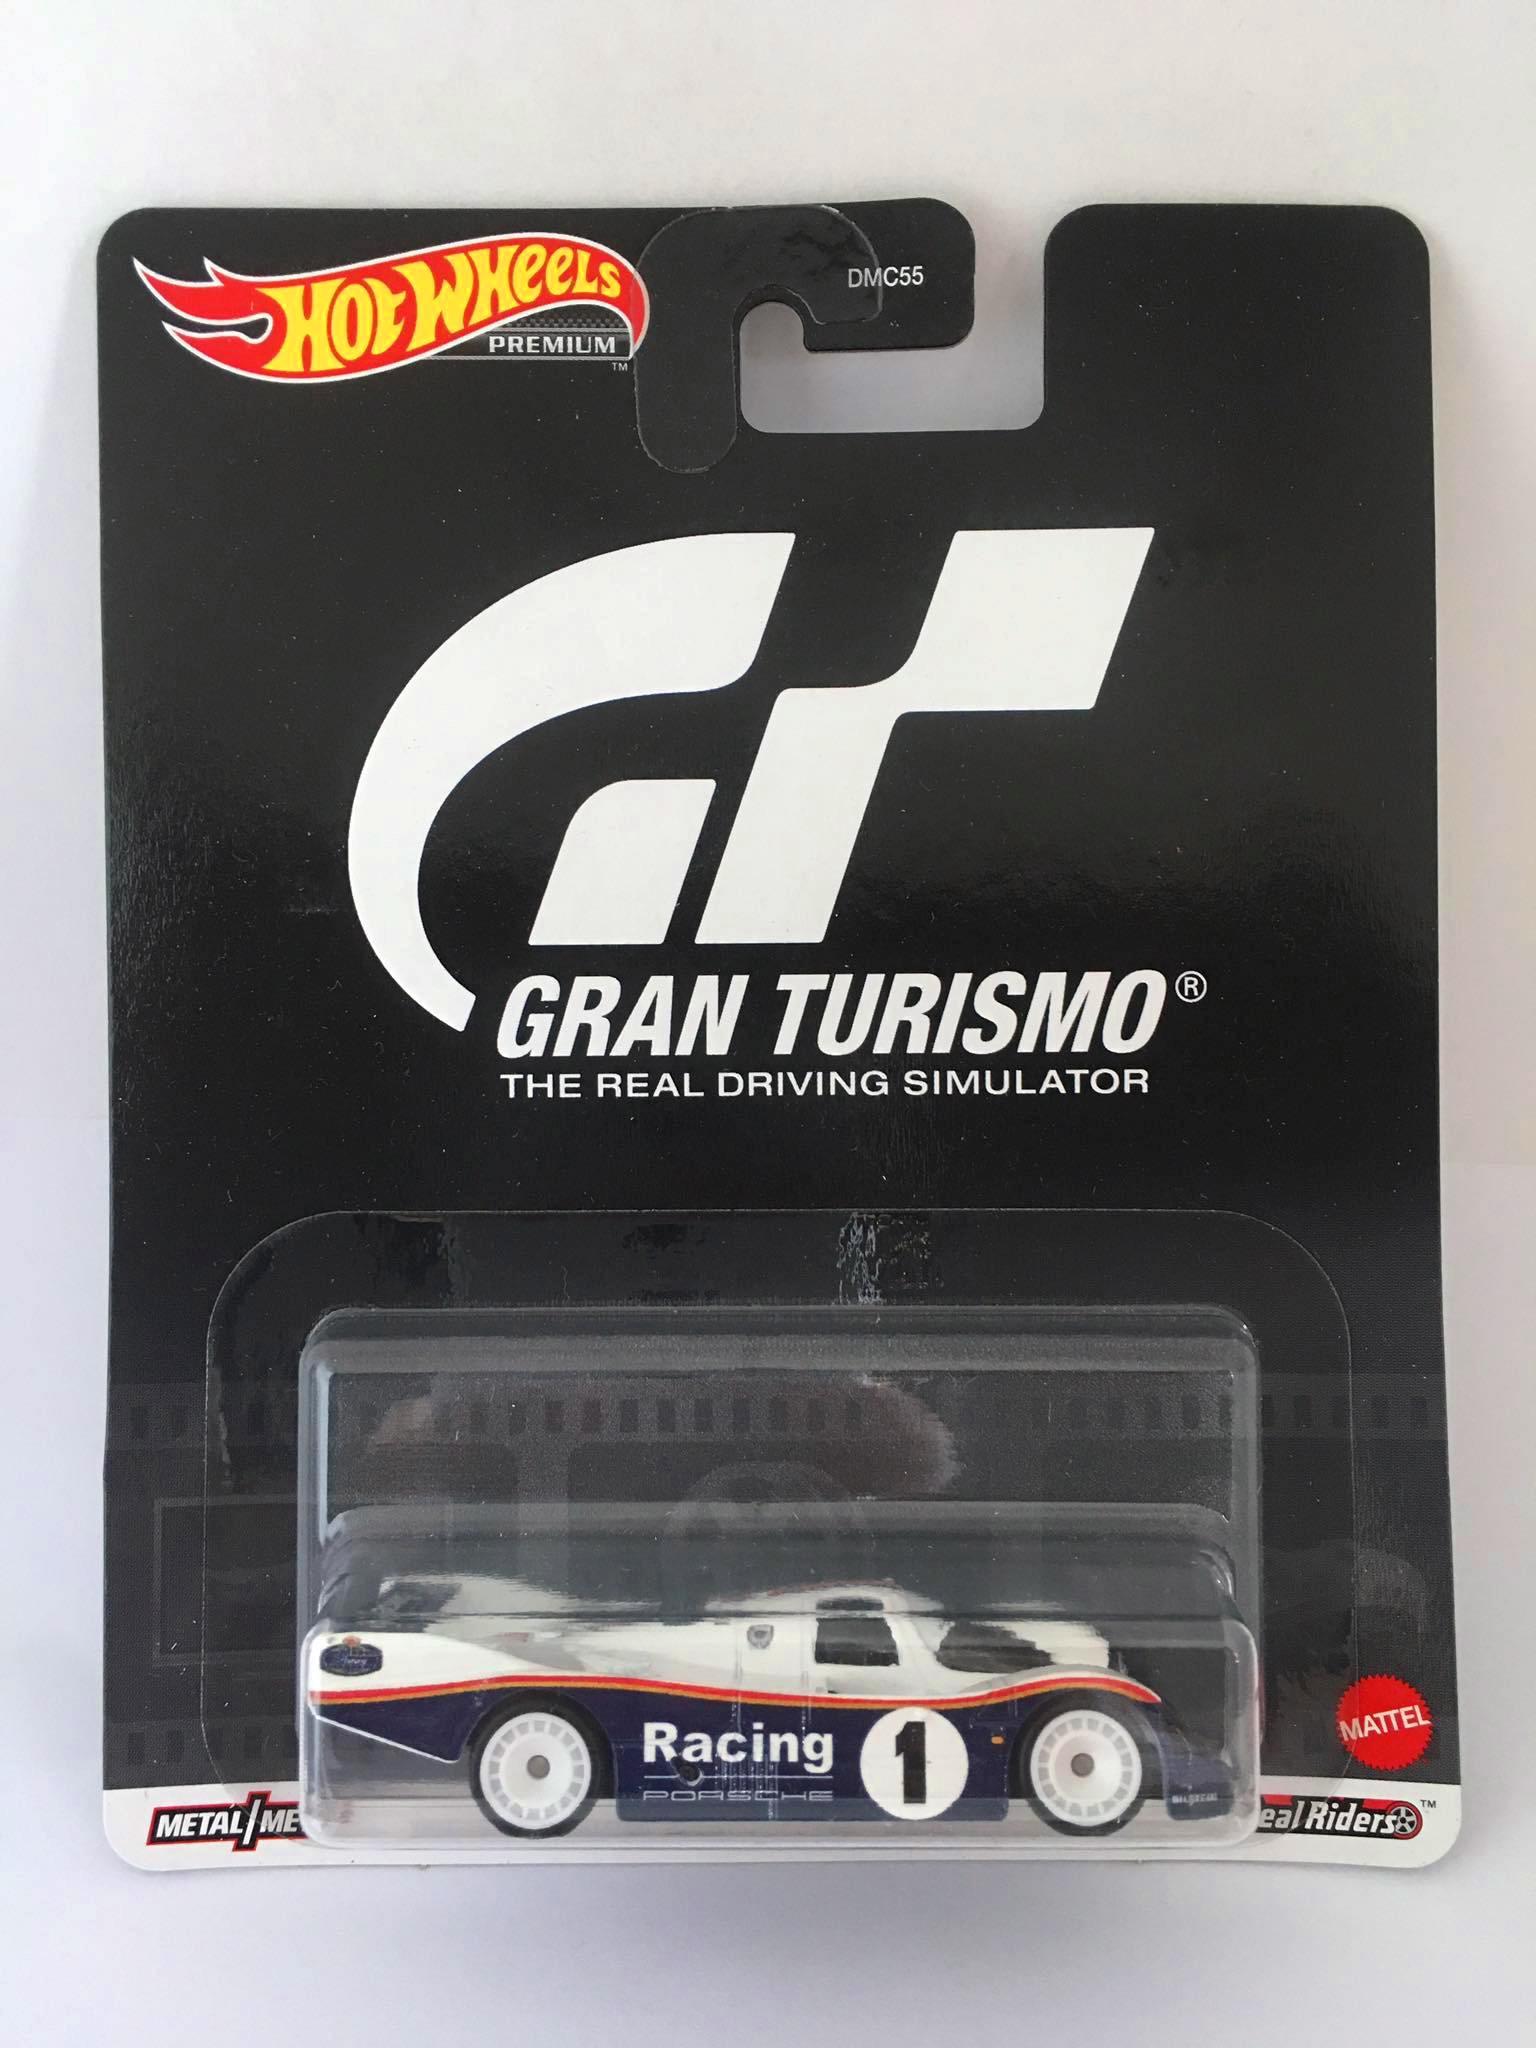 Hot Wheels - Porsche 962 Azul/Branco - Gran Turismo - Retro Mix T